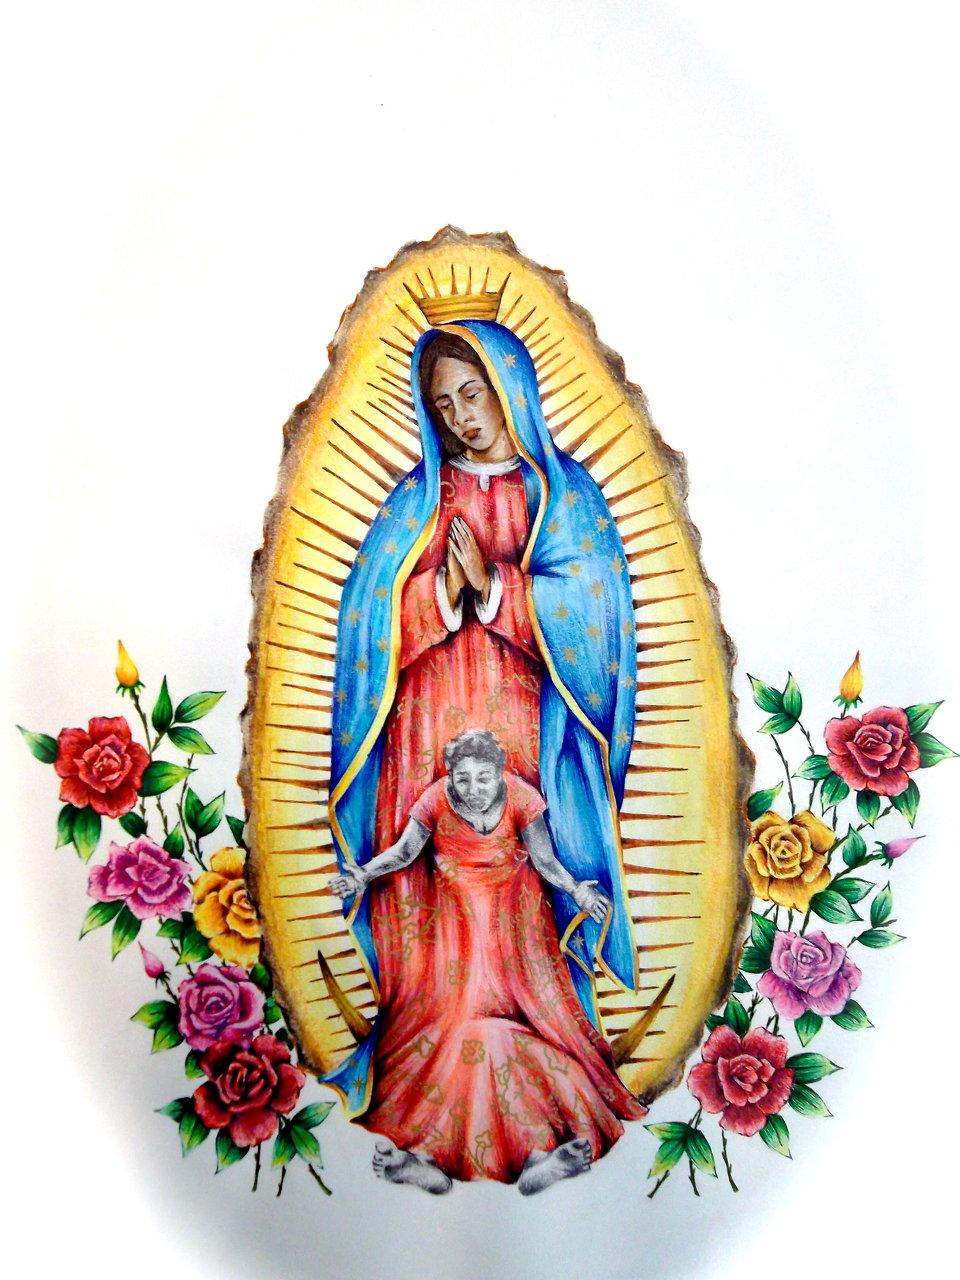 Ay Virgencita